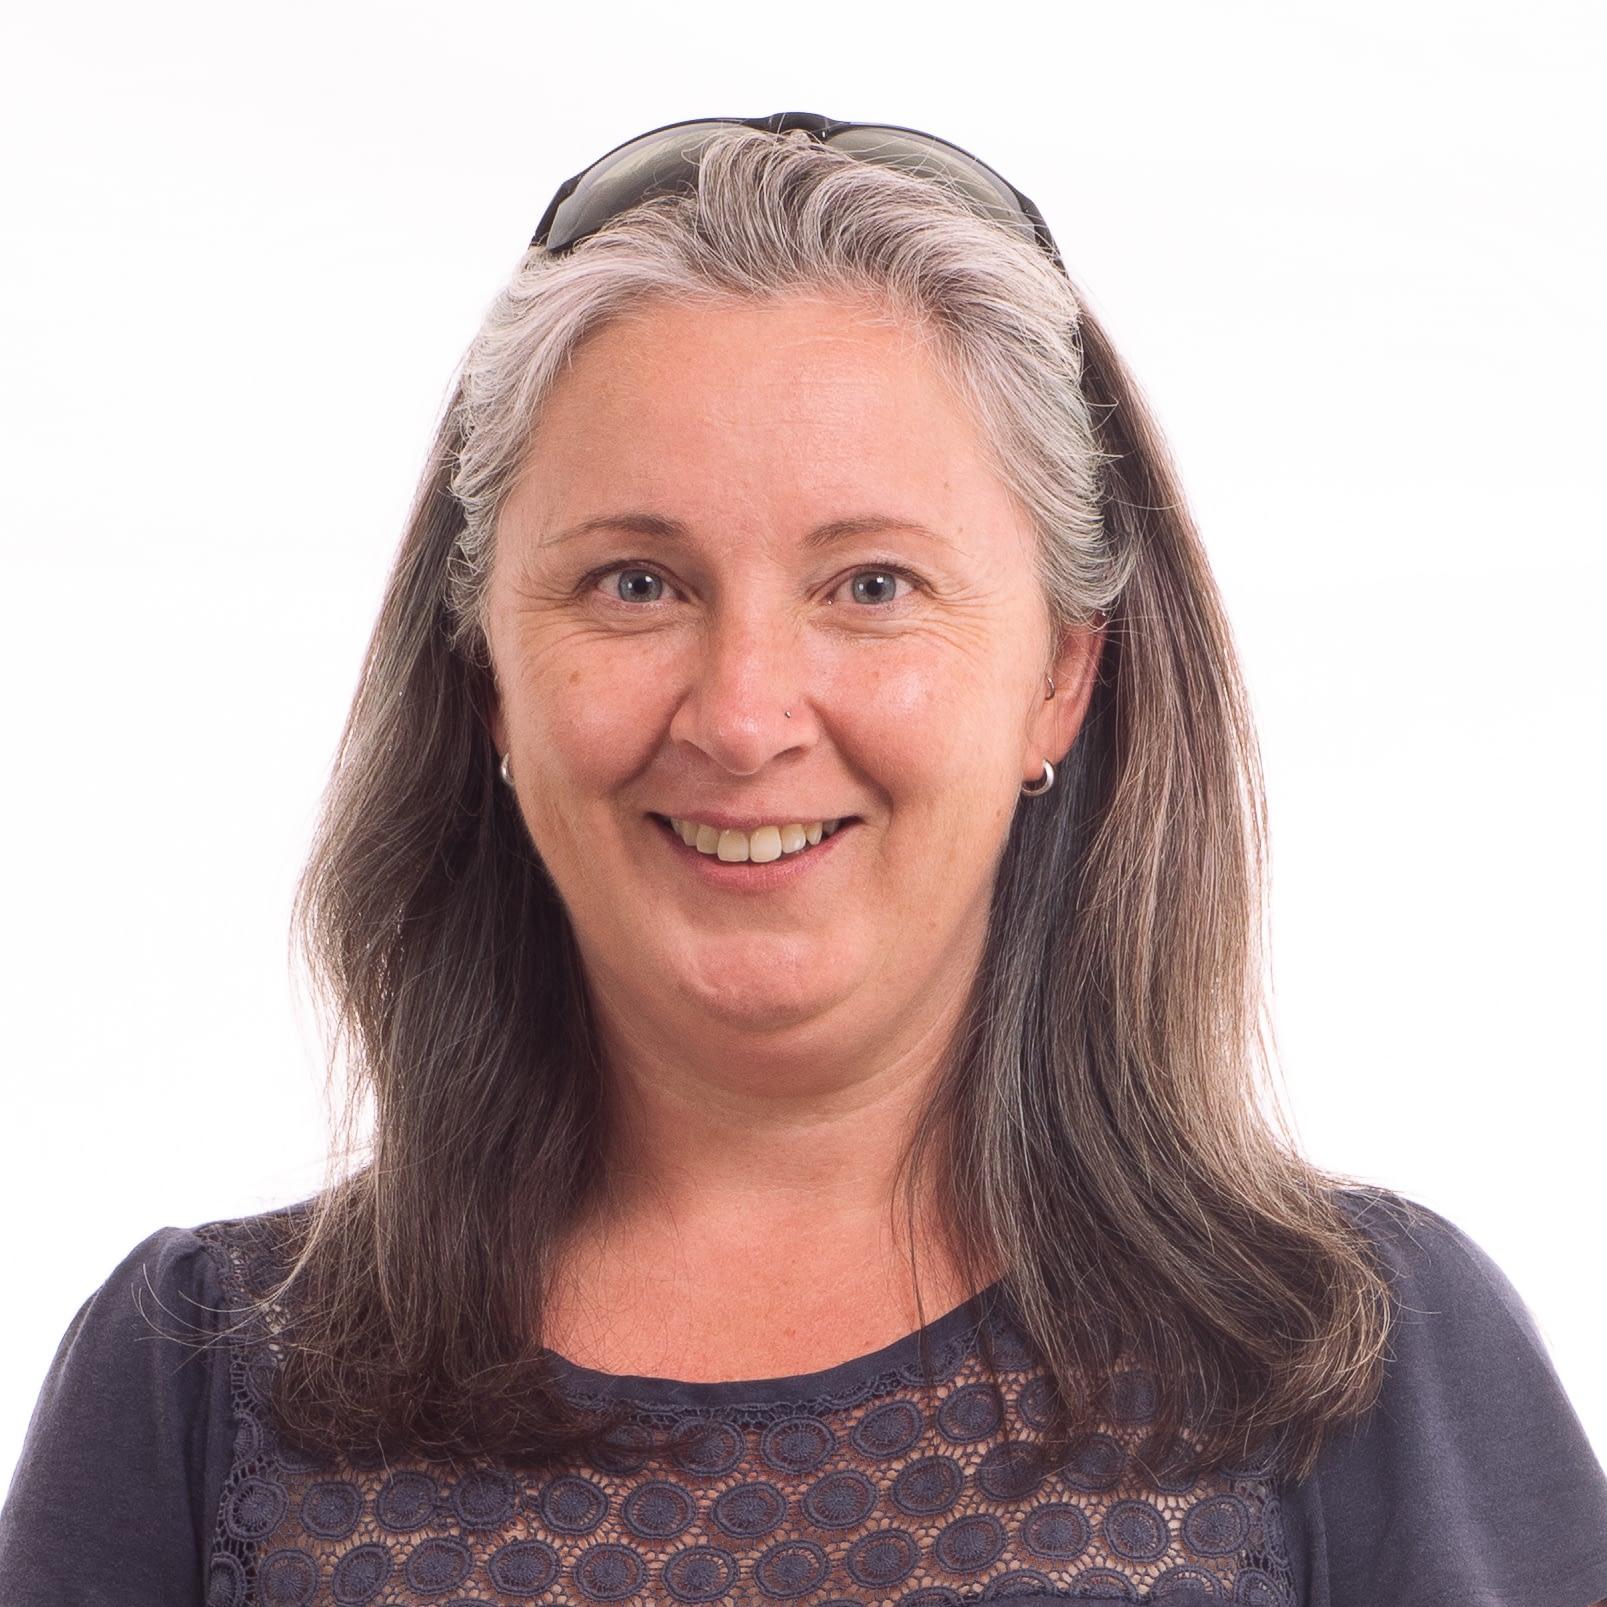 Profile image for Sarah Hearne